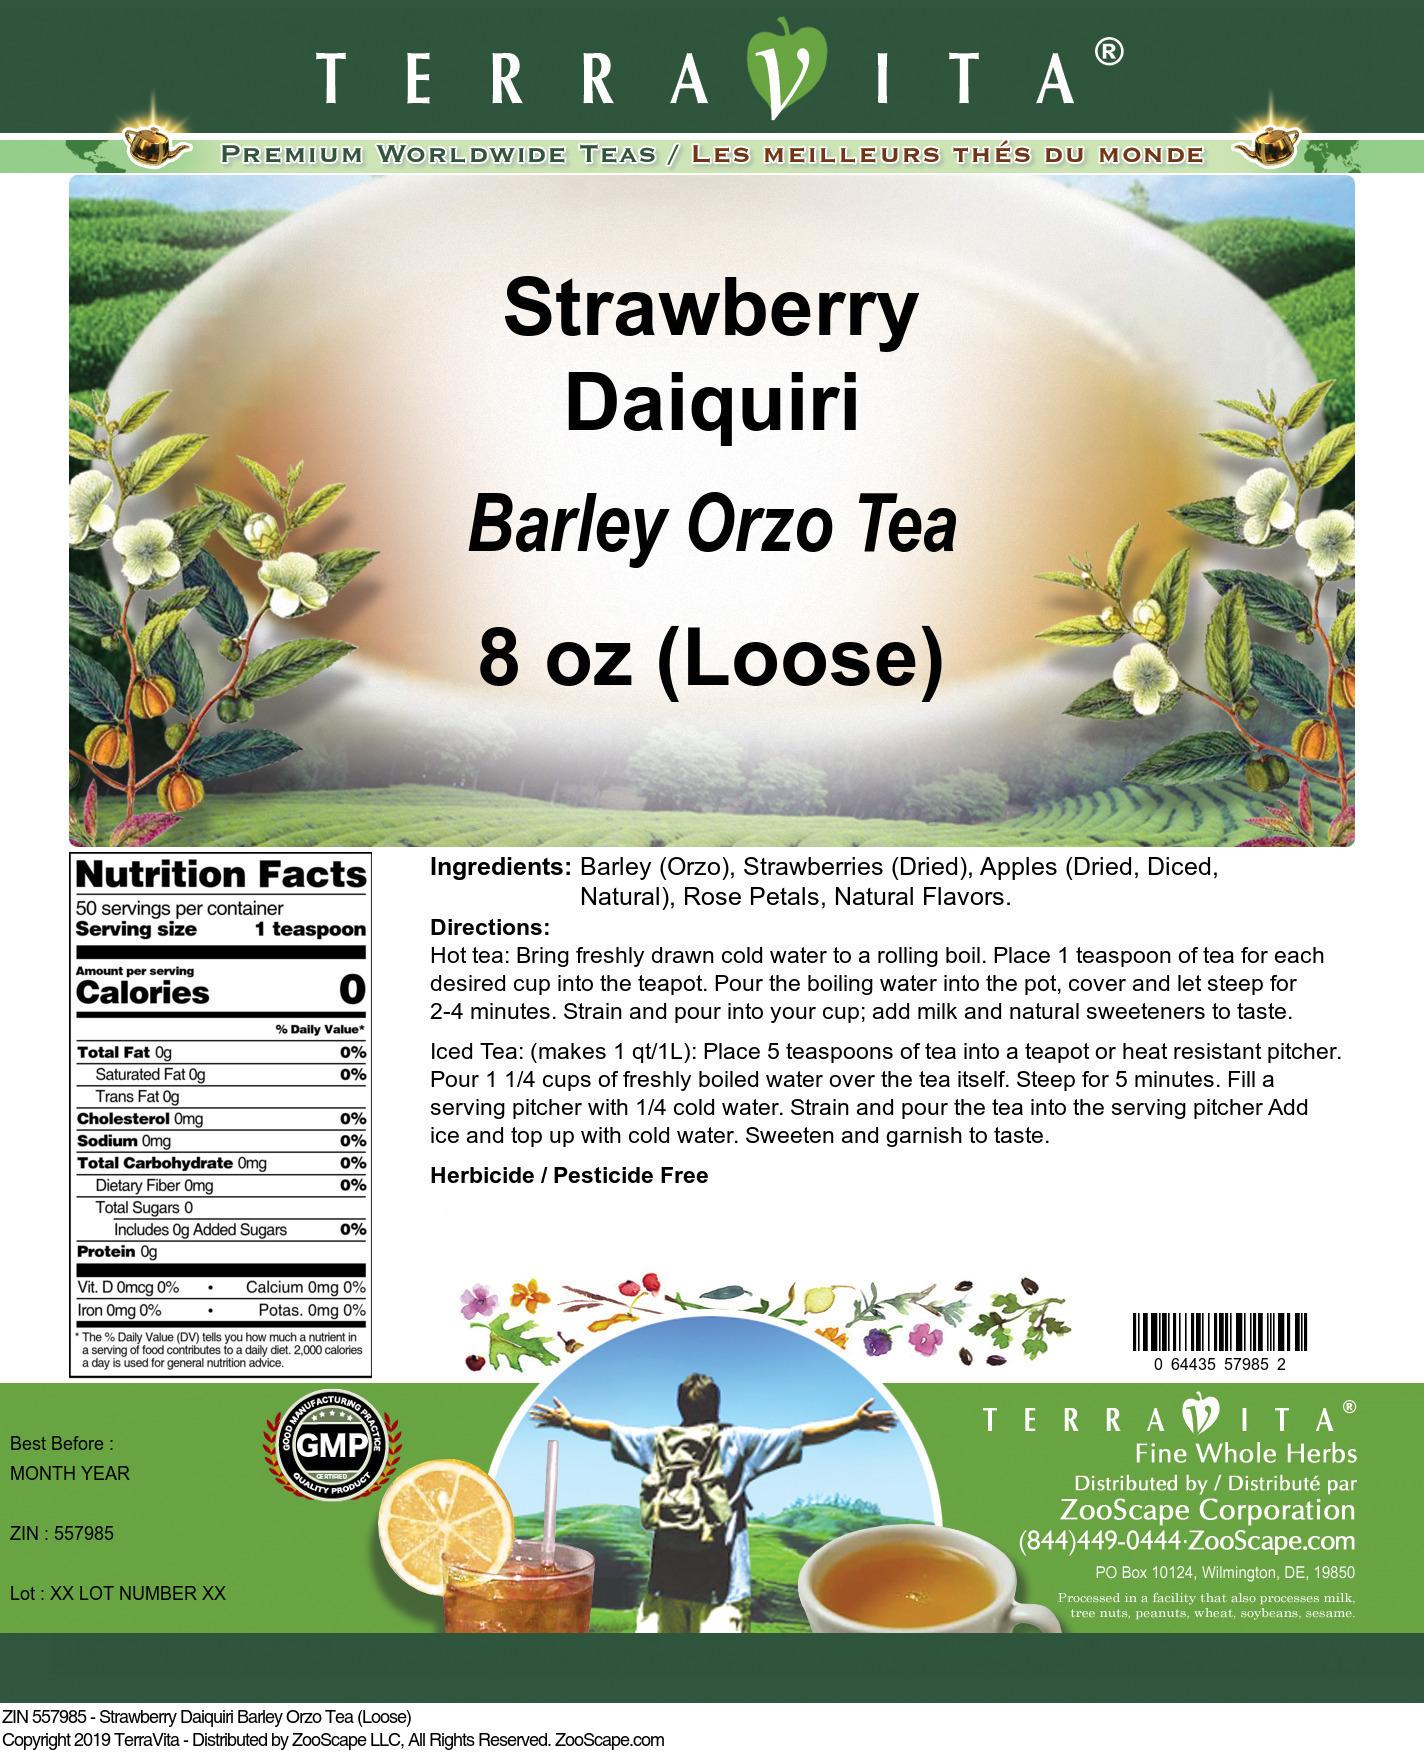 Strawberry Daiquiri Barley Orzo